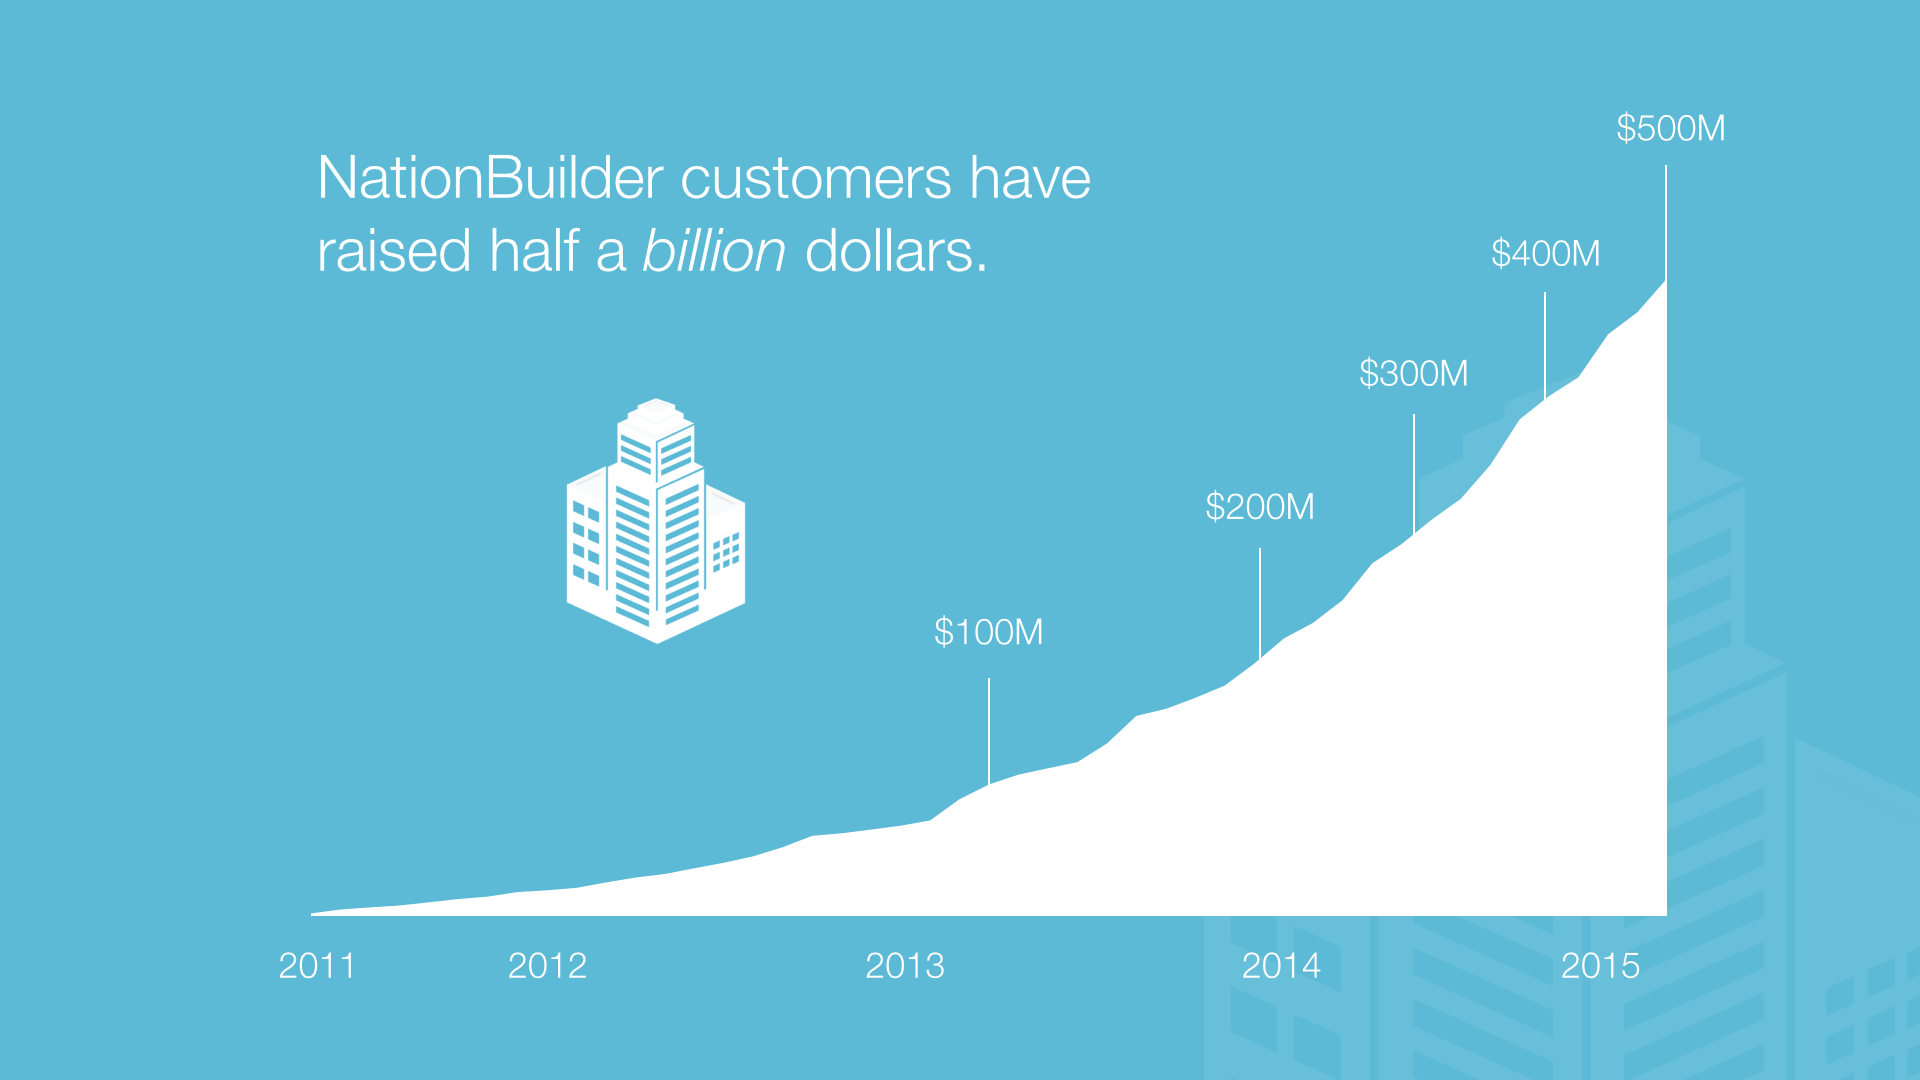 NationBuilder customers have raised half a billion dollars!